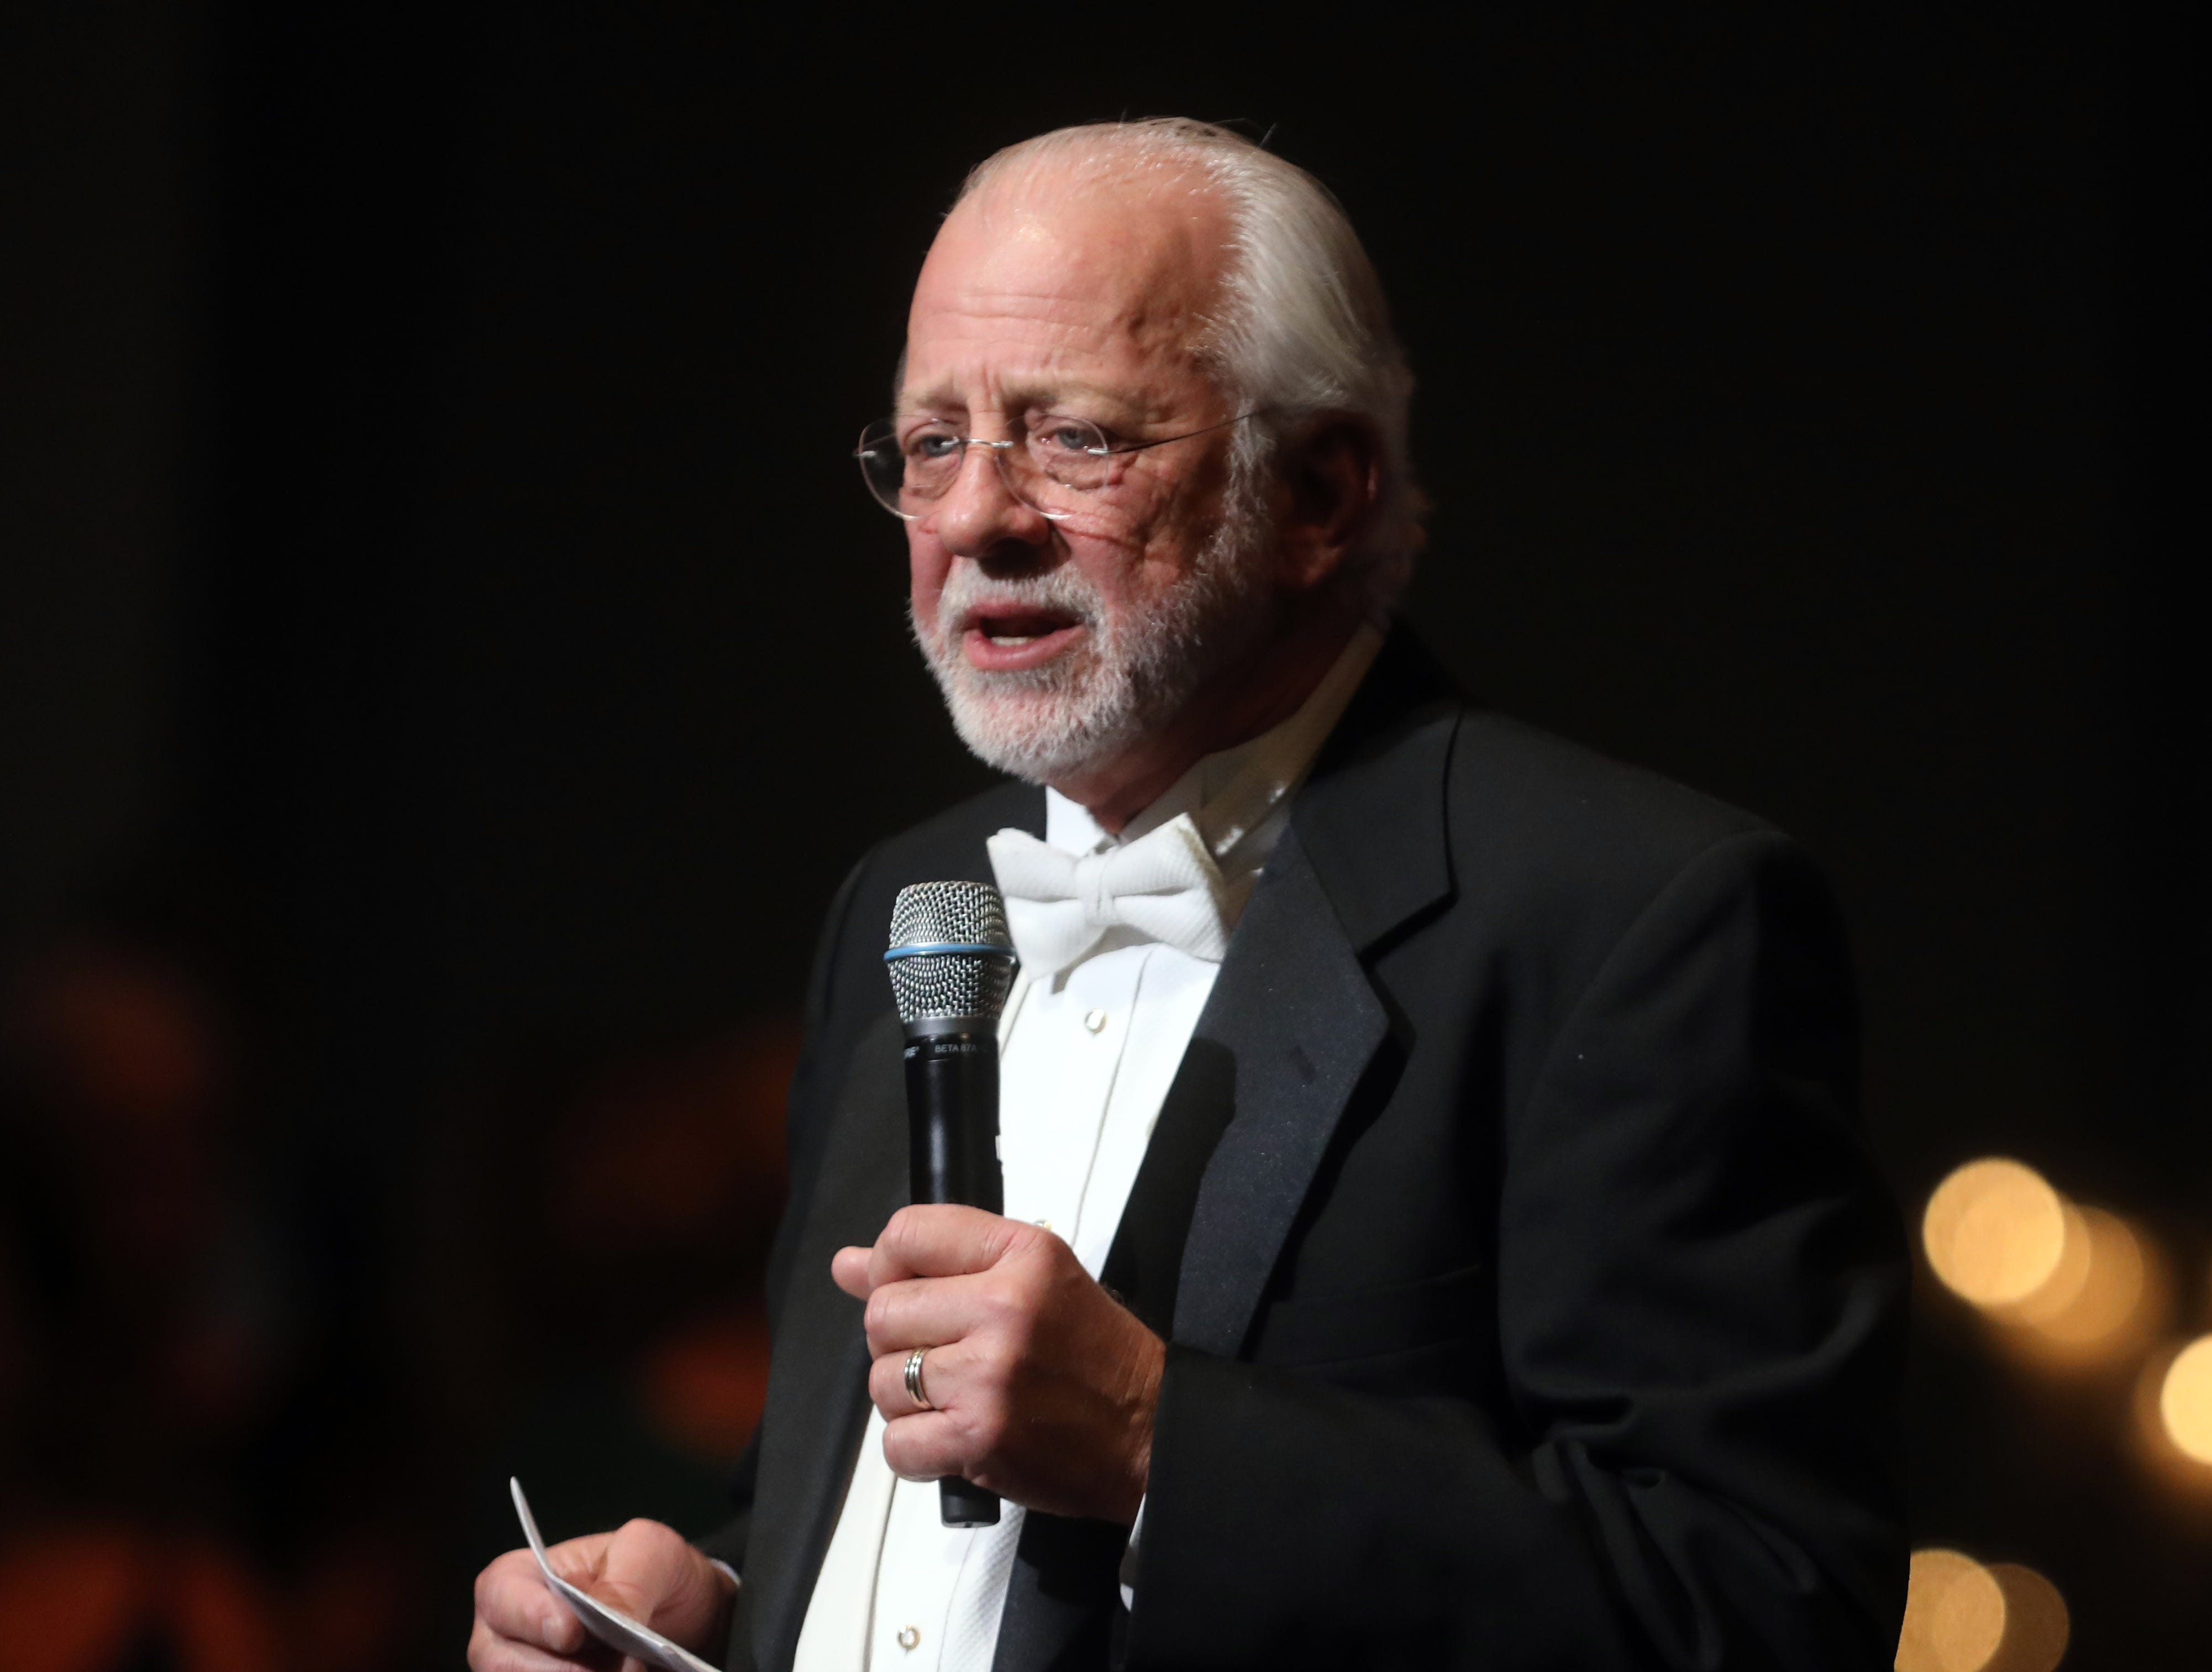 Alan Valentine speaks at the 34th annual Symphony Ball on Saturday, December 8, 2018, at Schermerhorn Symphony Center.